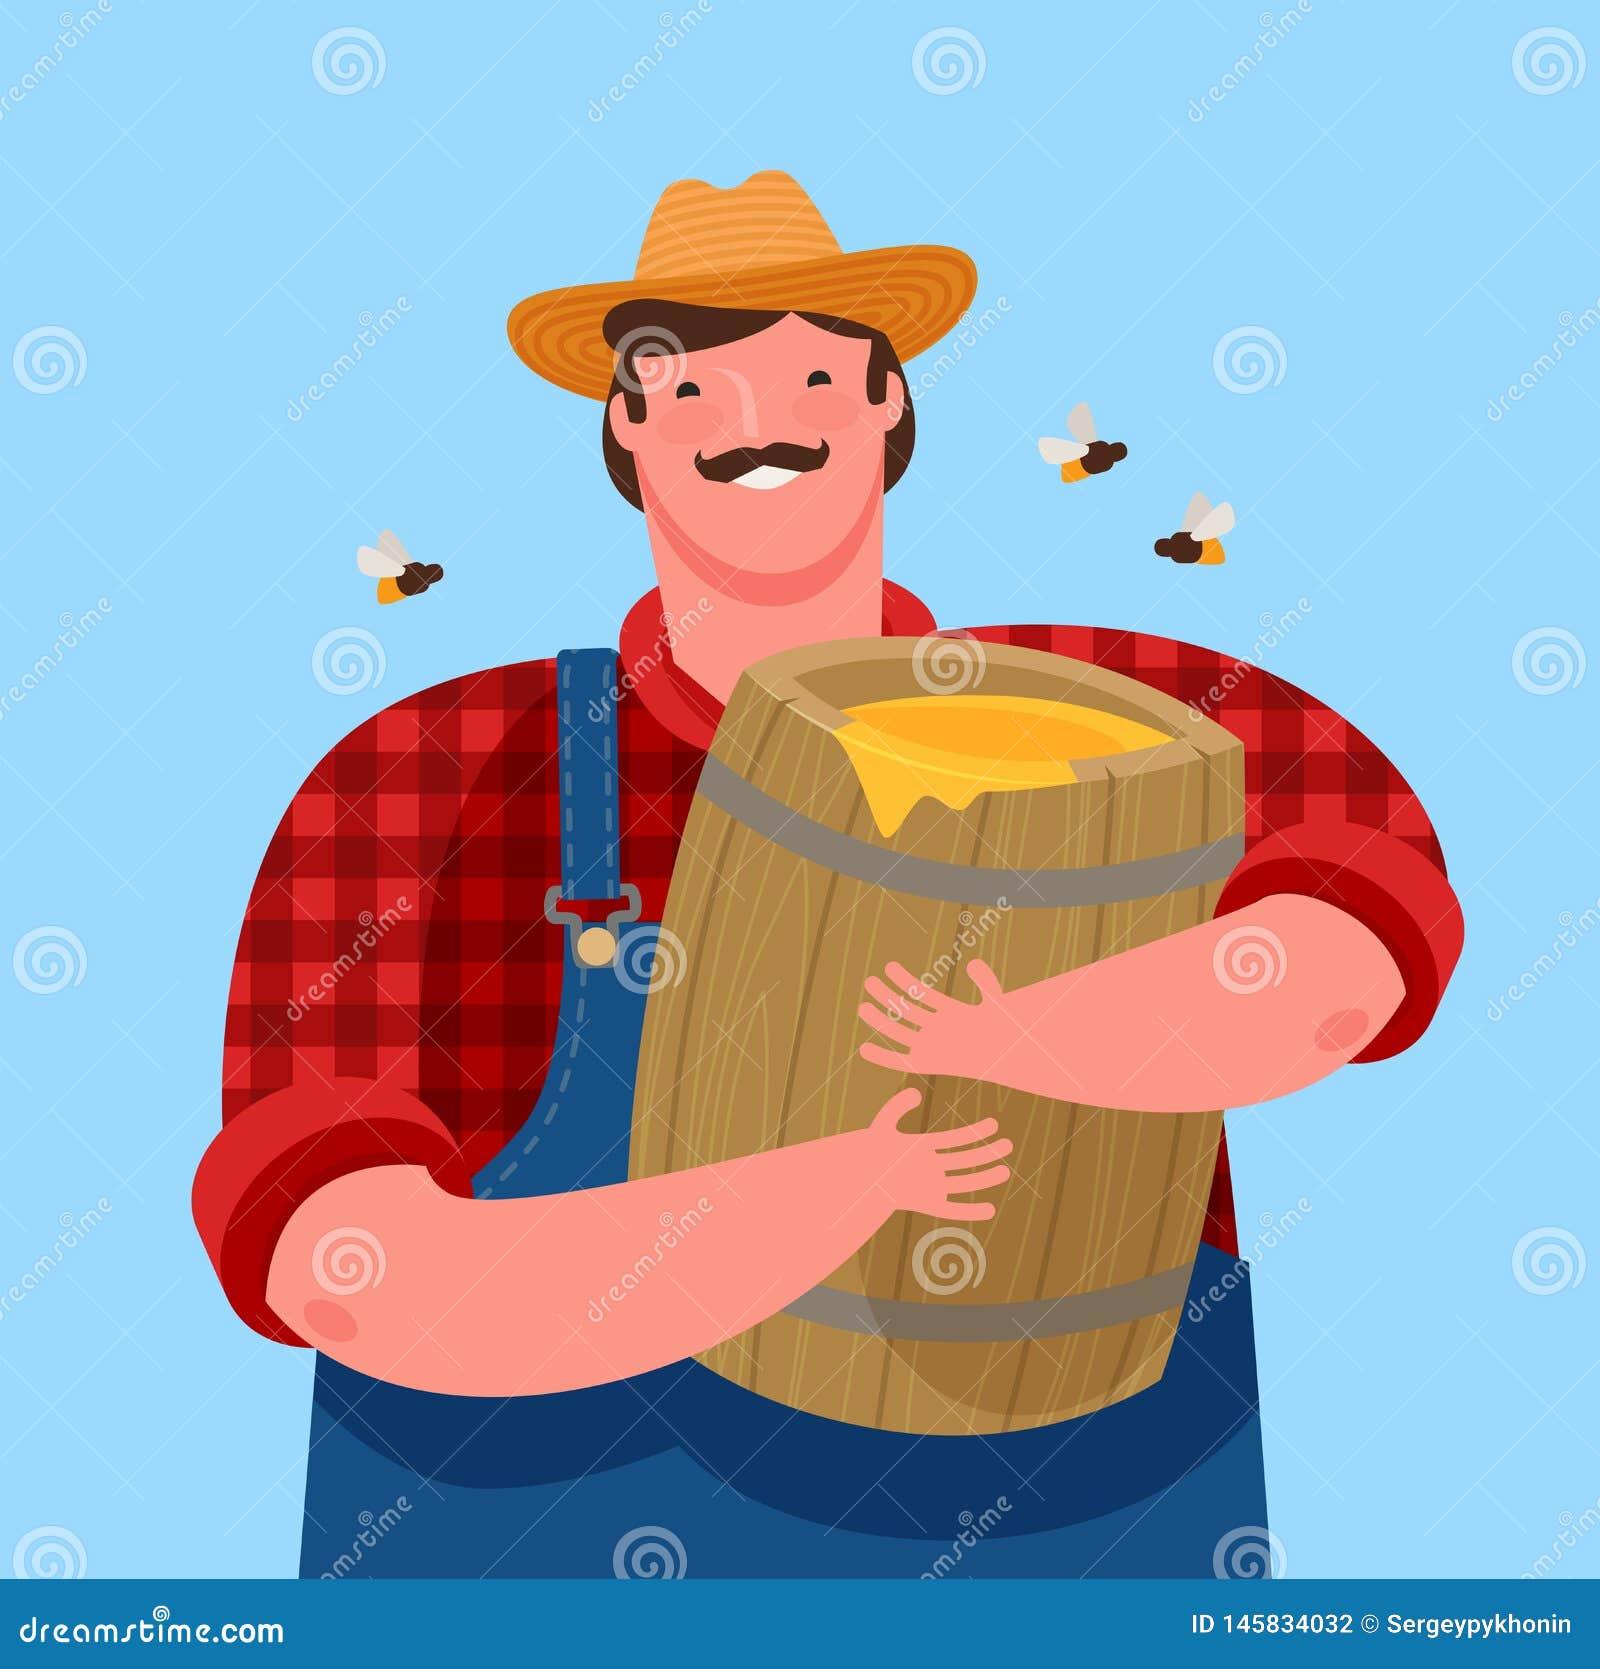 Beekeeper is holding a wooden keg with honey. Beekeeping, cartoon vector illustration